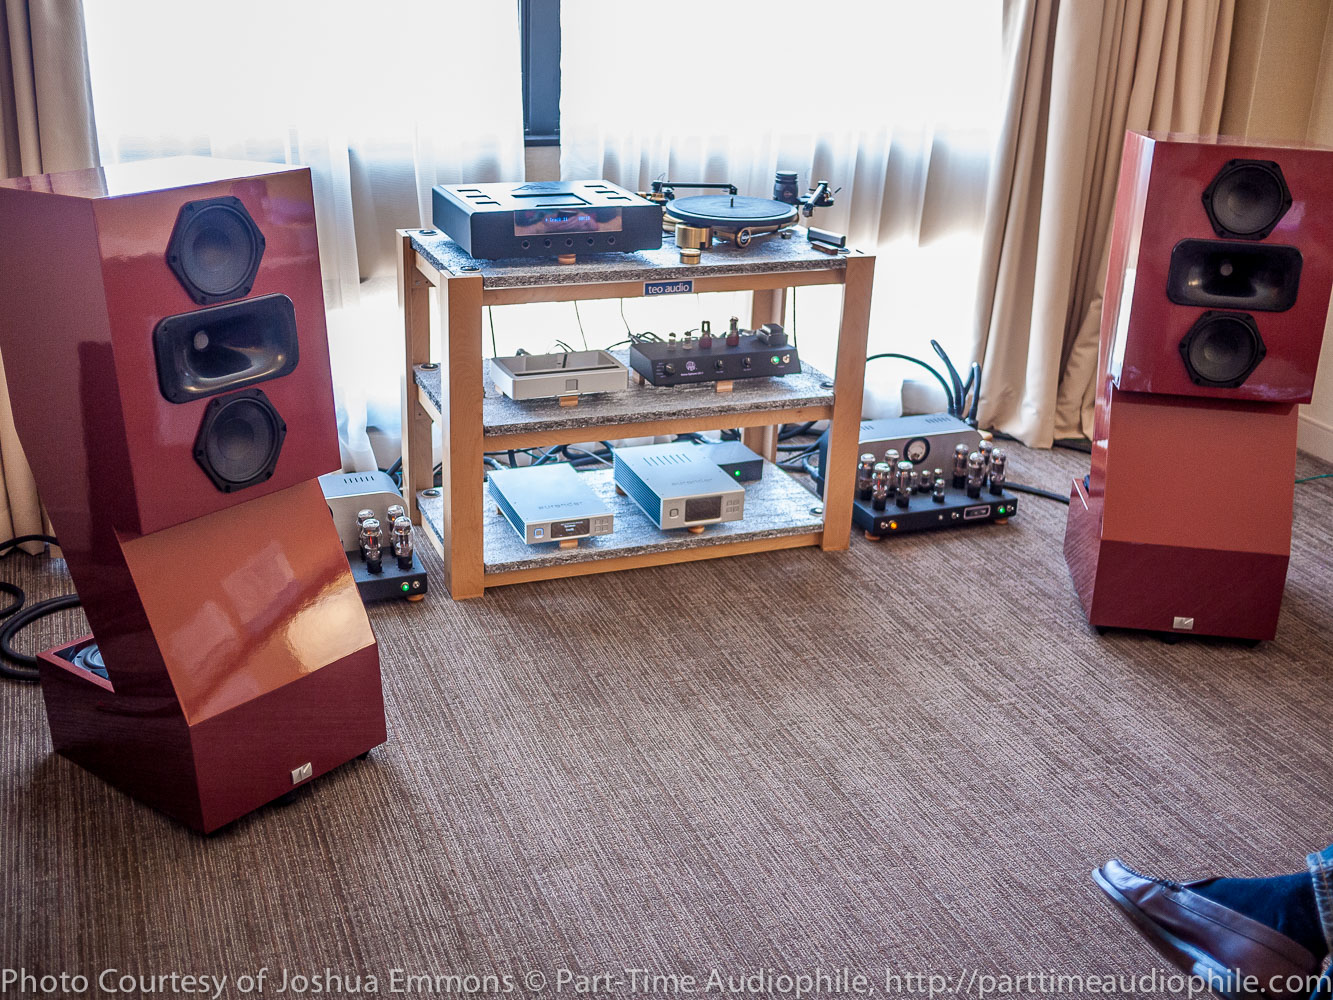 AXPONA 2015: Essential Audio with AudioKinesis, Atma-Sphere, Exogal, Aurender, Kuzma